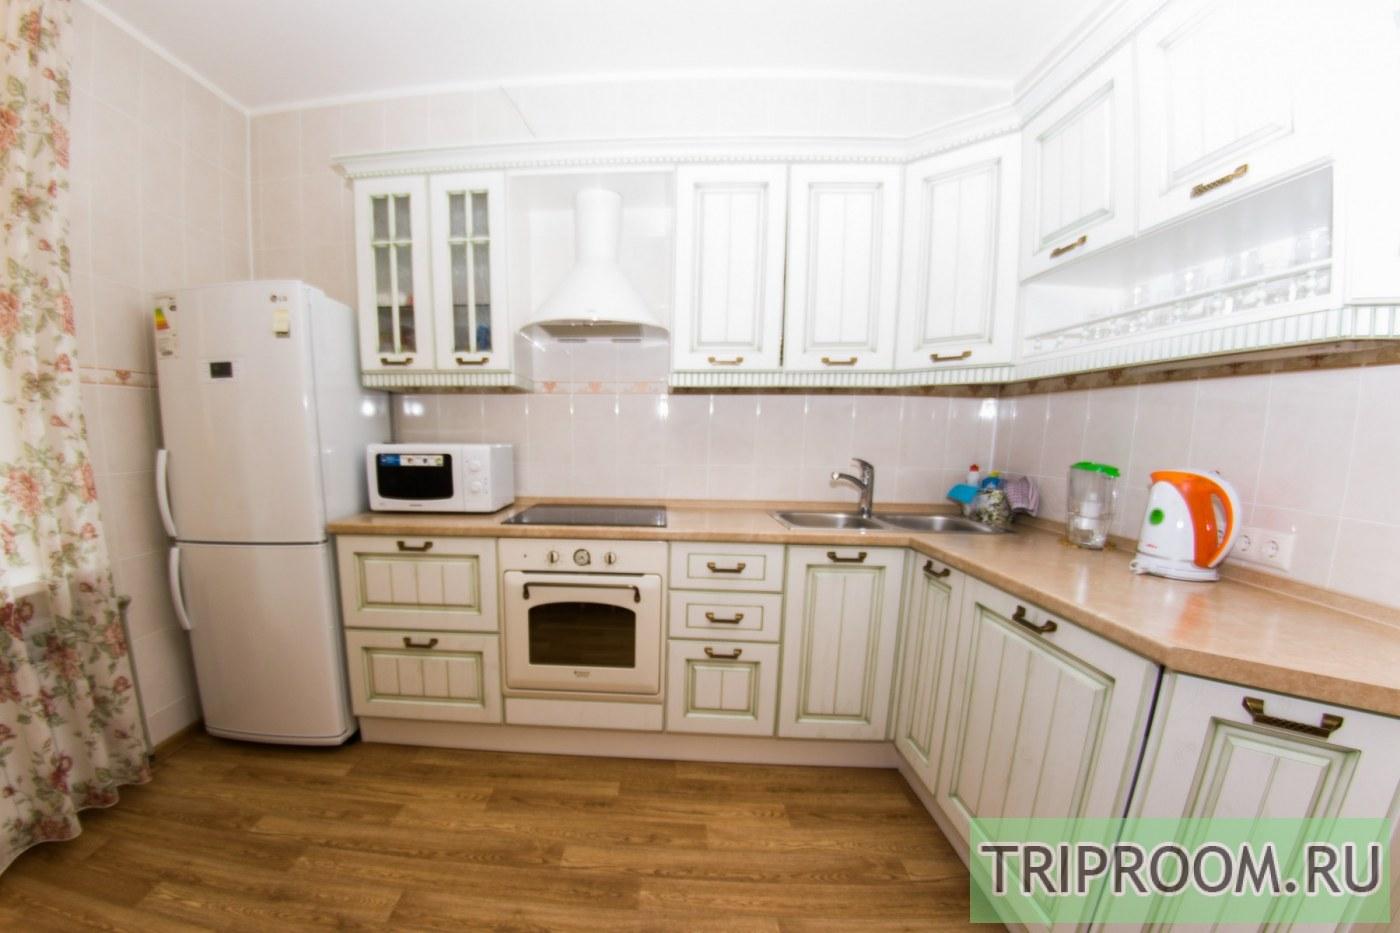 1-комнатная квартира посуточно (вариант № 39814), ул. Ленинский проспект, фото № 6